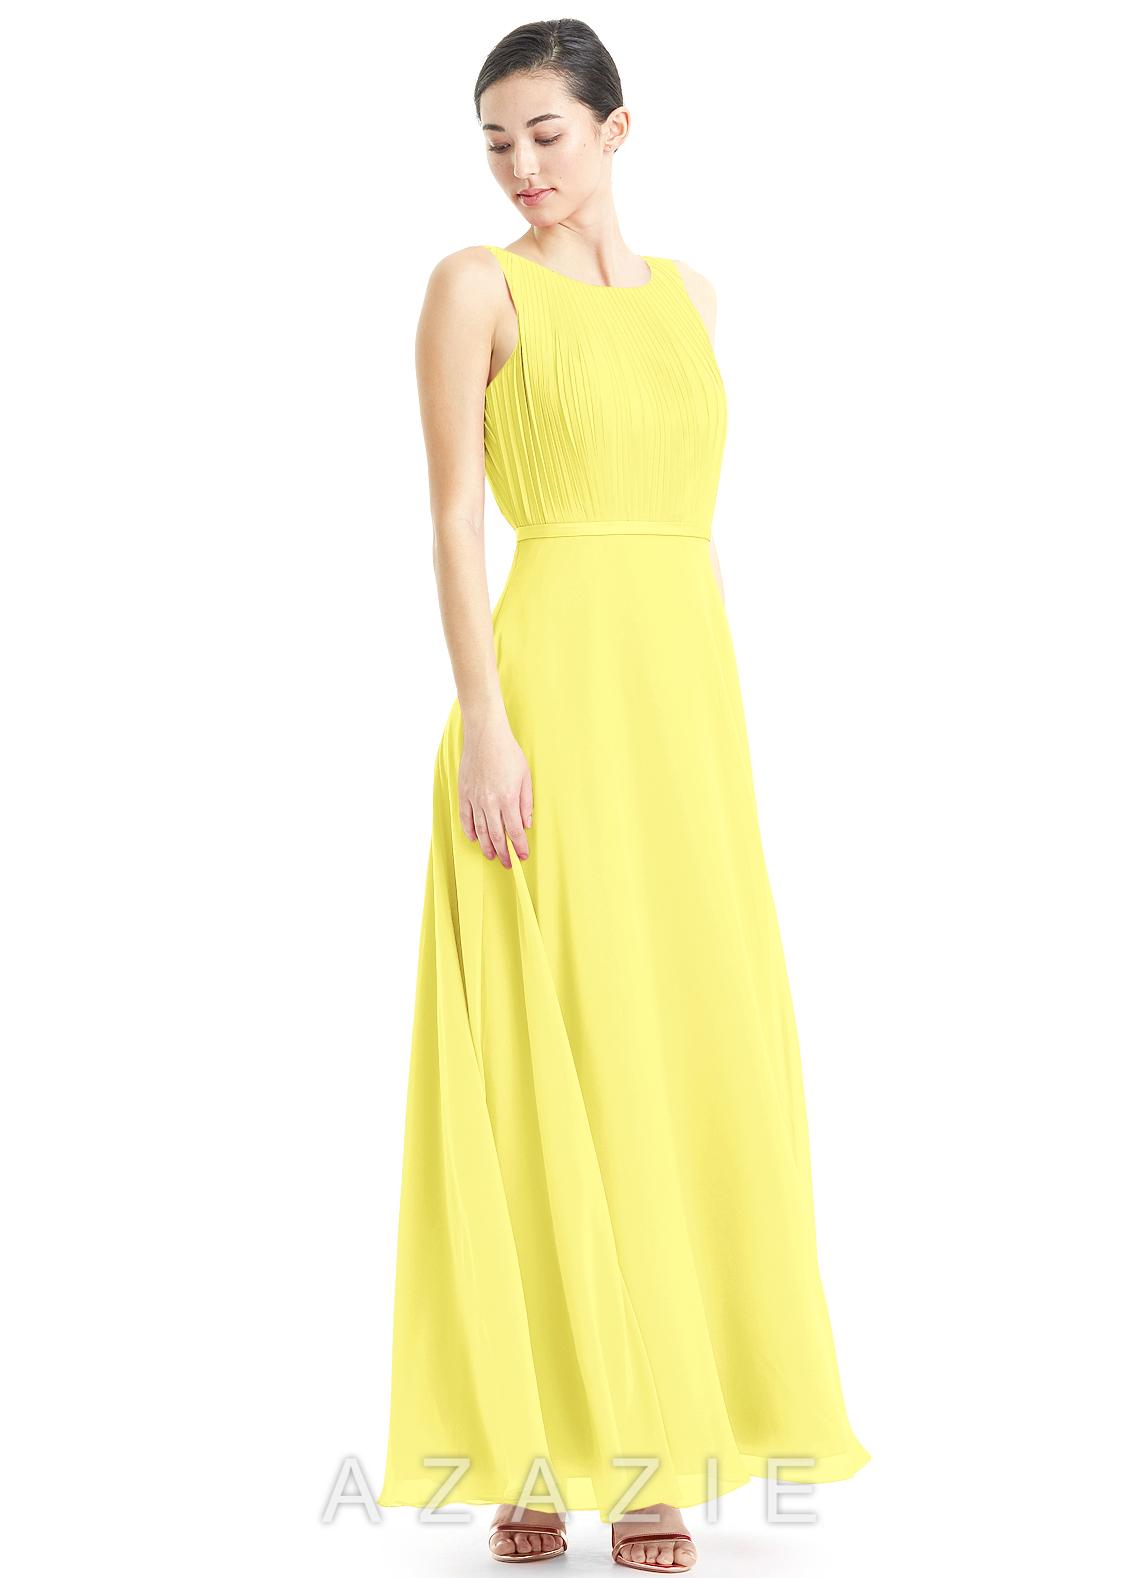 Azazie avery bridesmaid dress azazie color lemon ombrellifo Choice Image